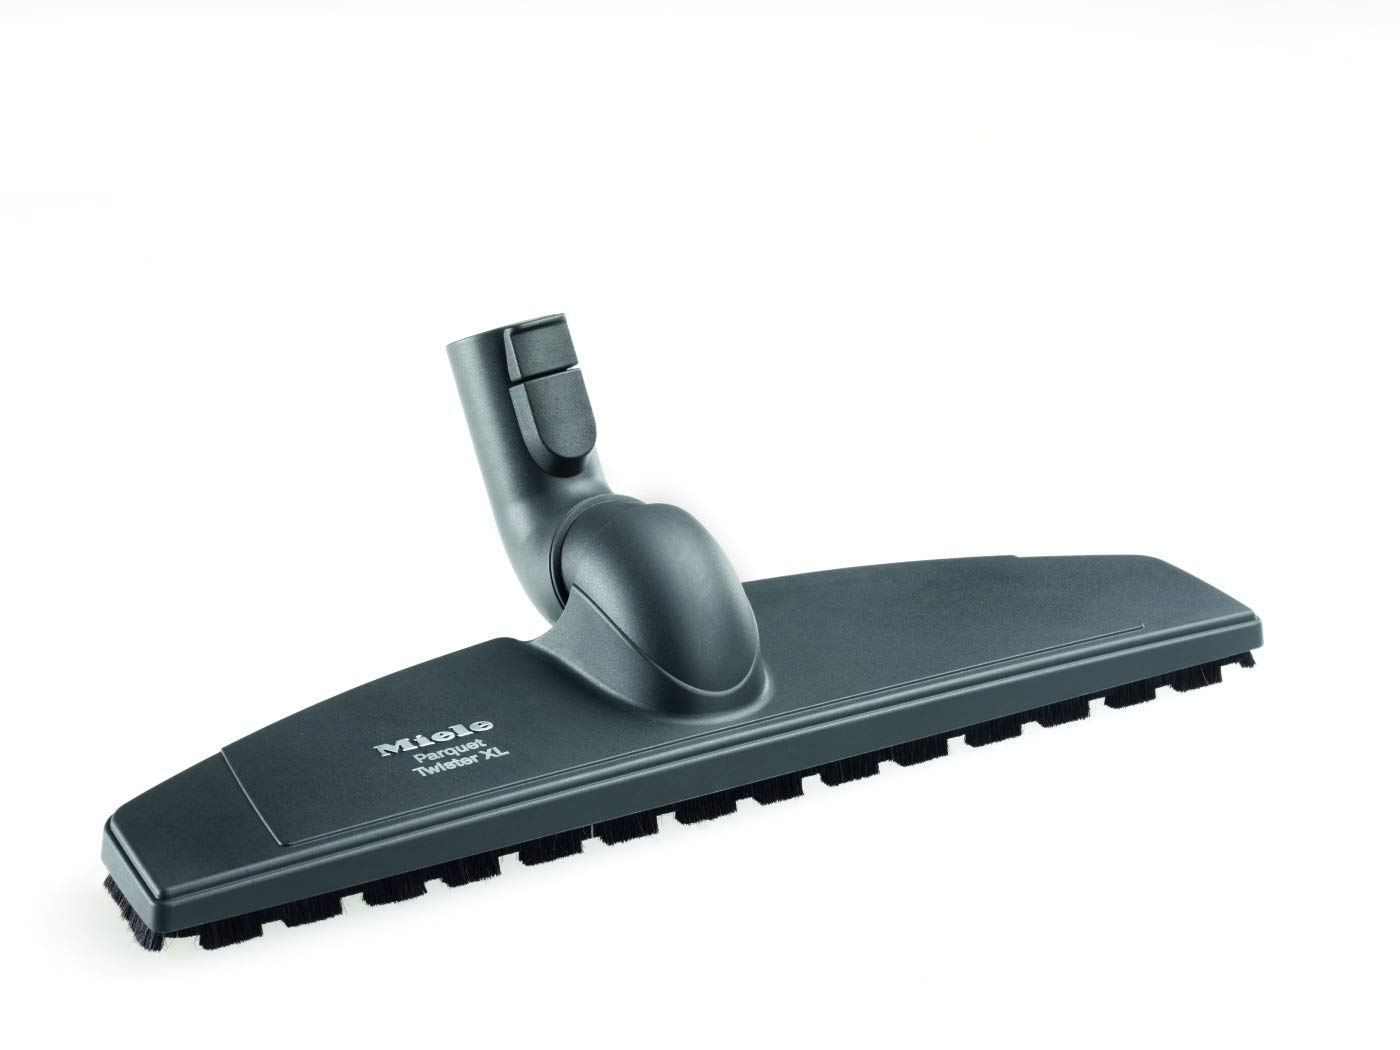 Miele SBB 400-3 Parquet Twister XL Smooth Floor Brush by Miele